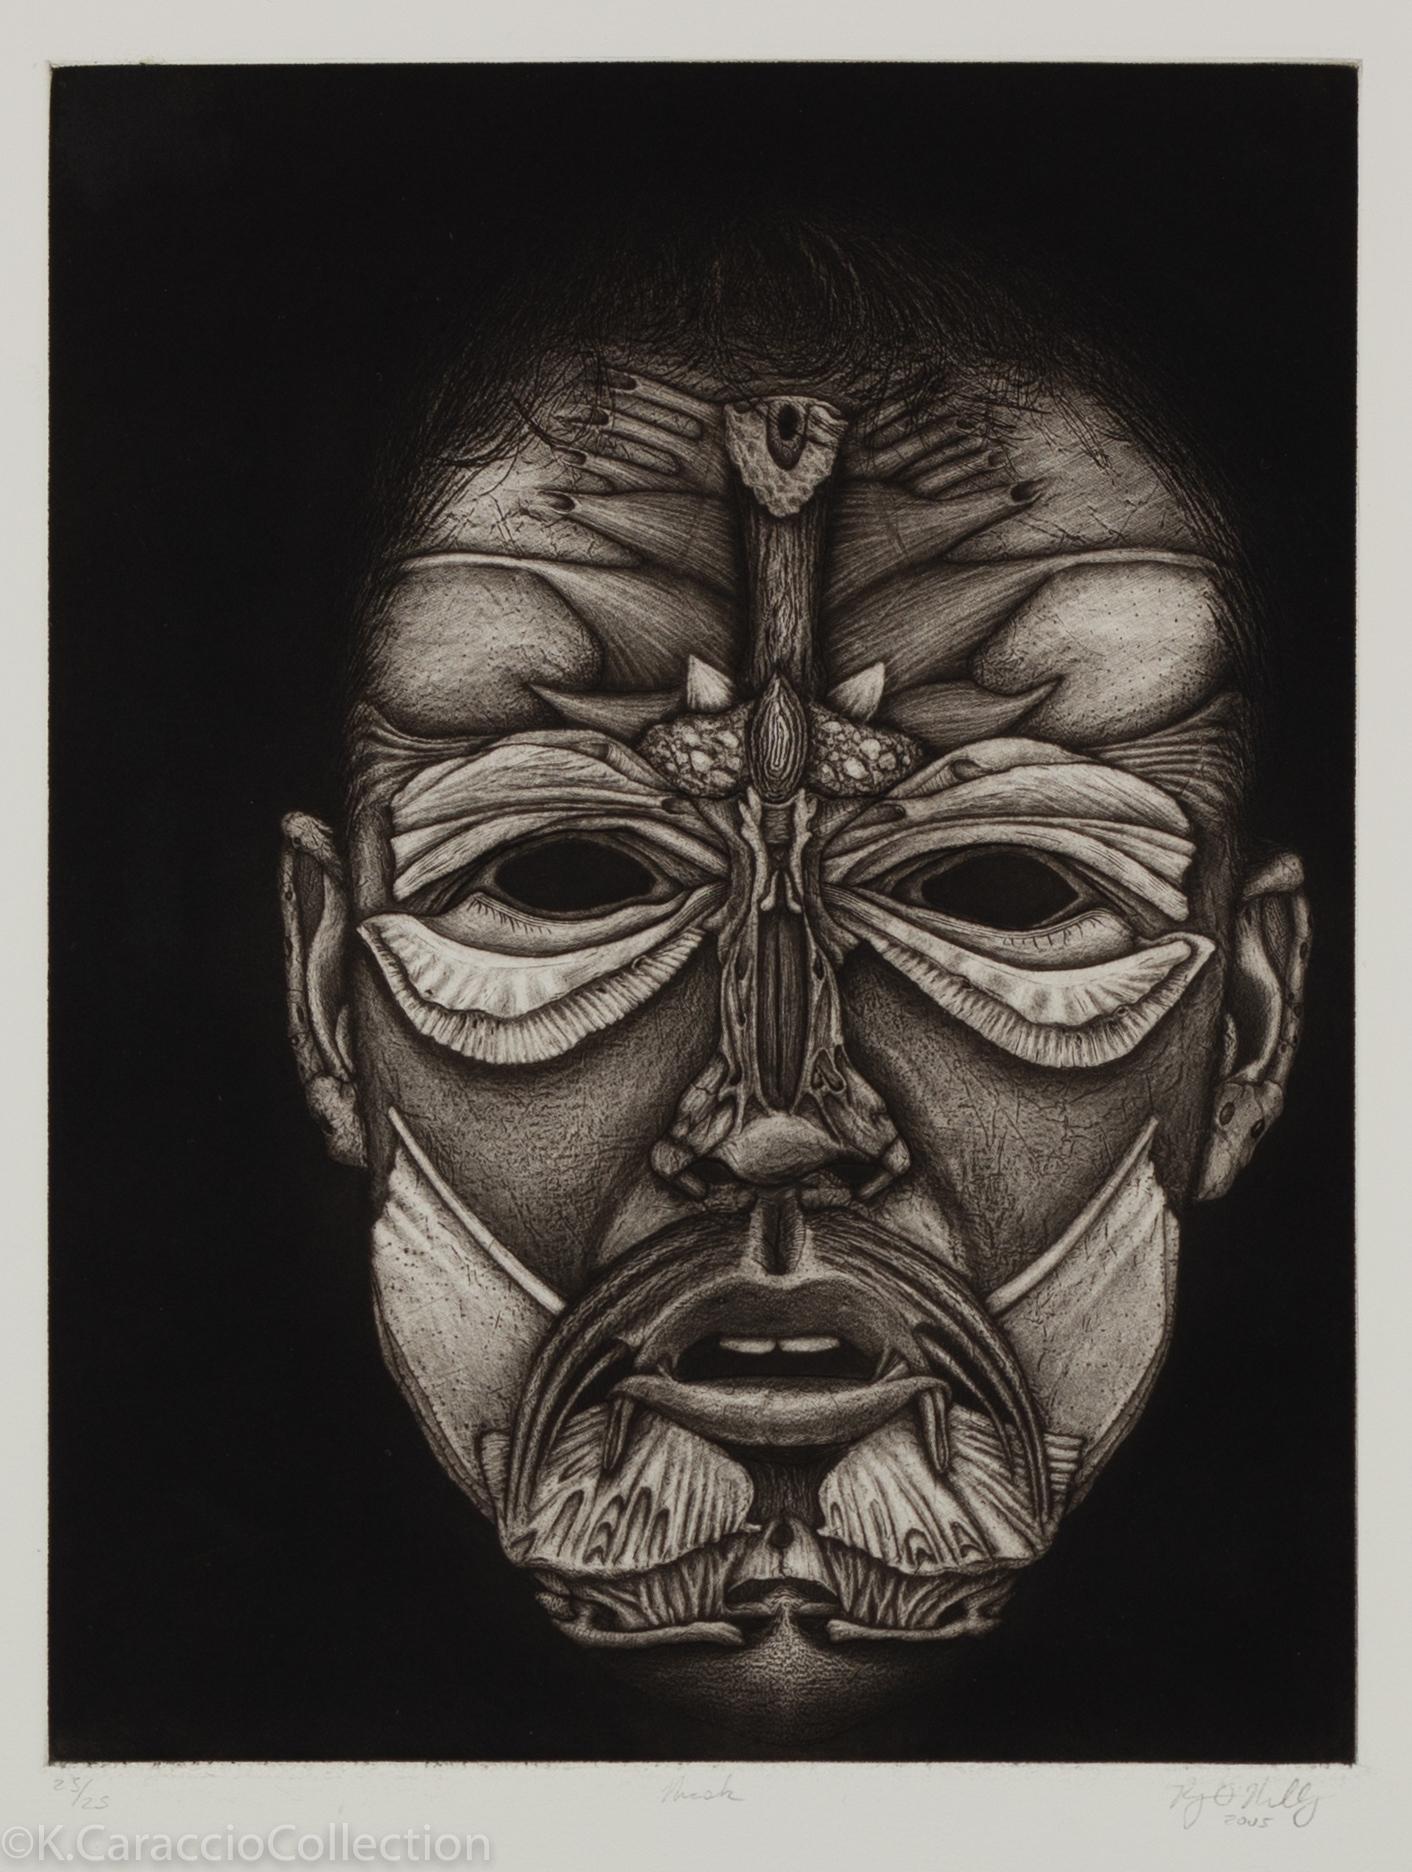 Mask, 2005